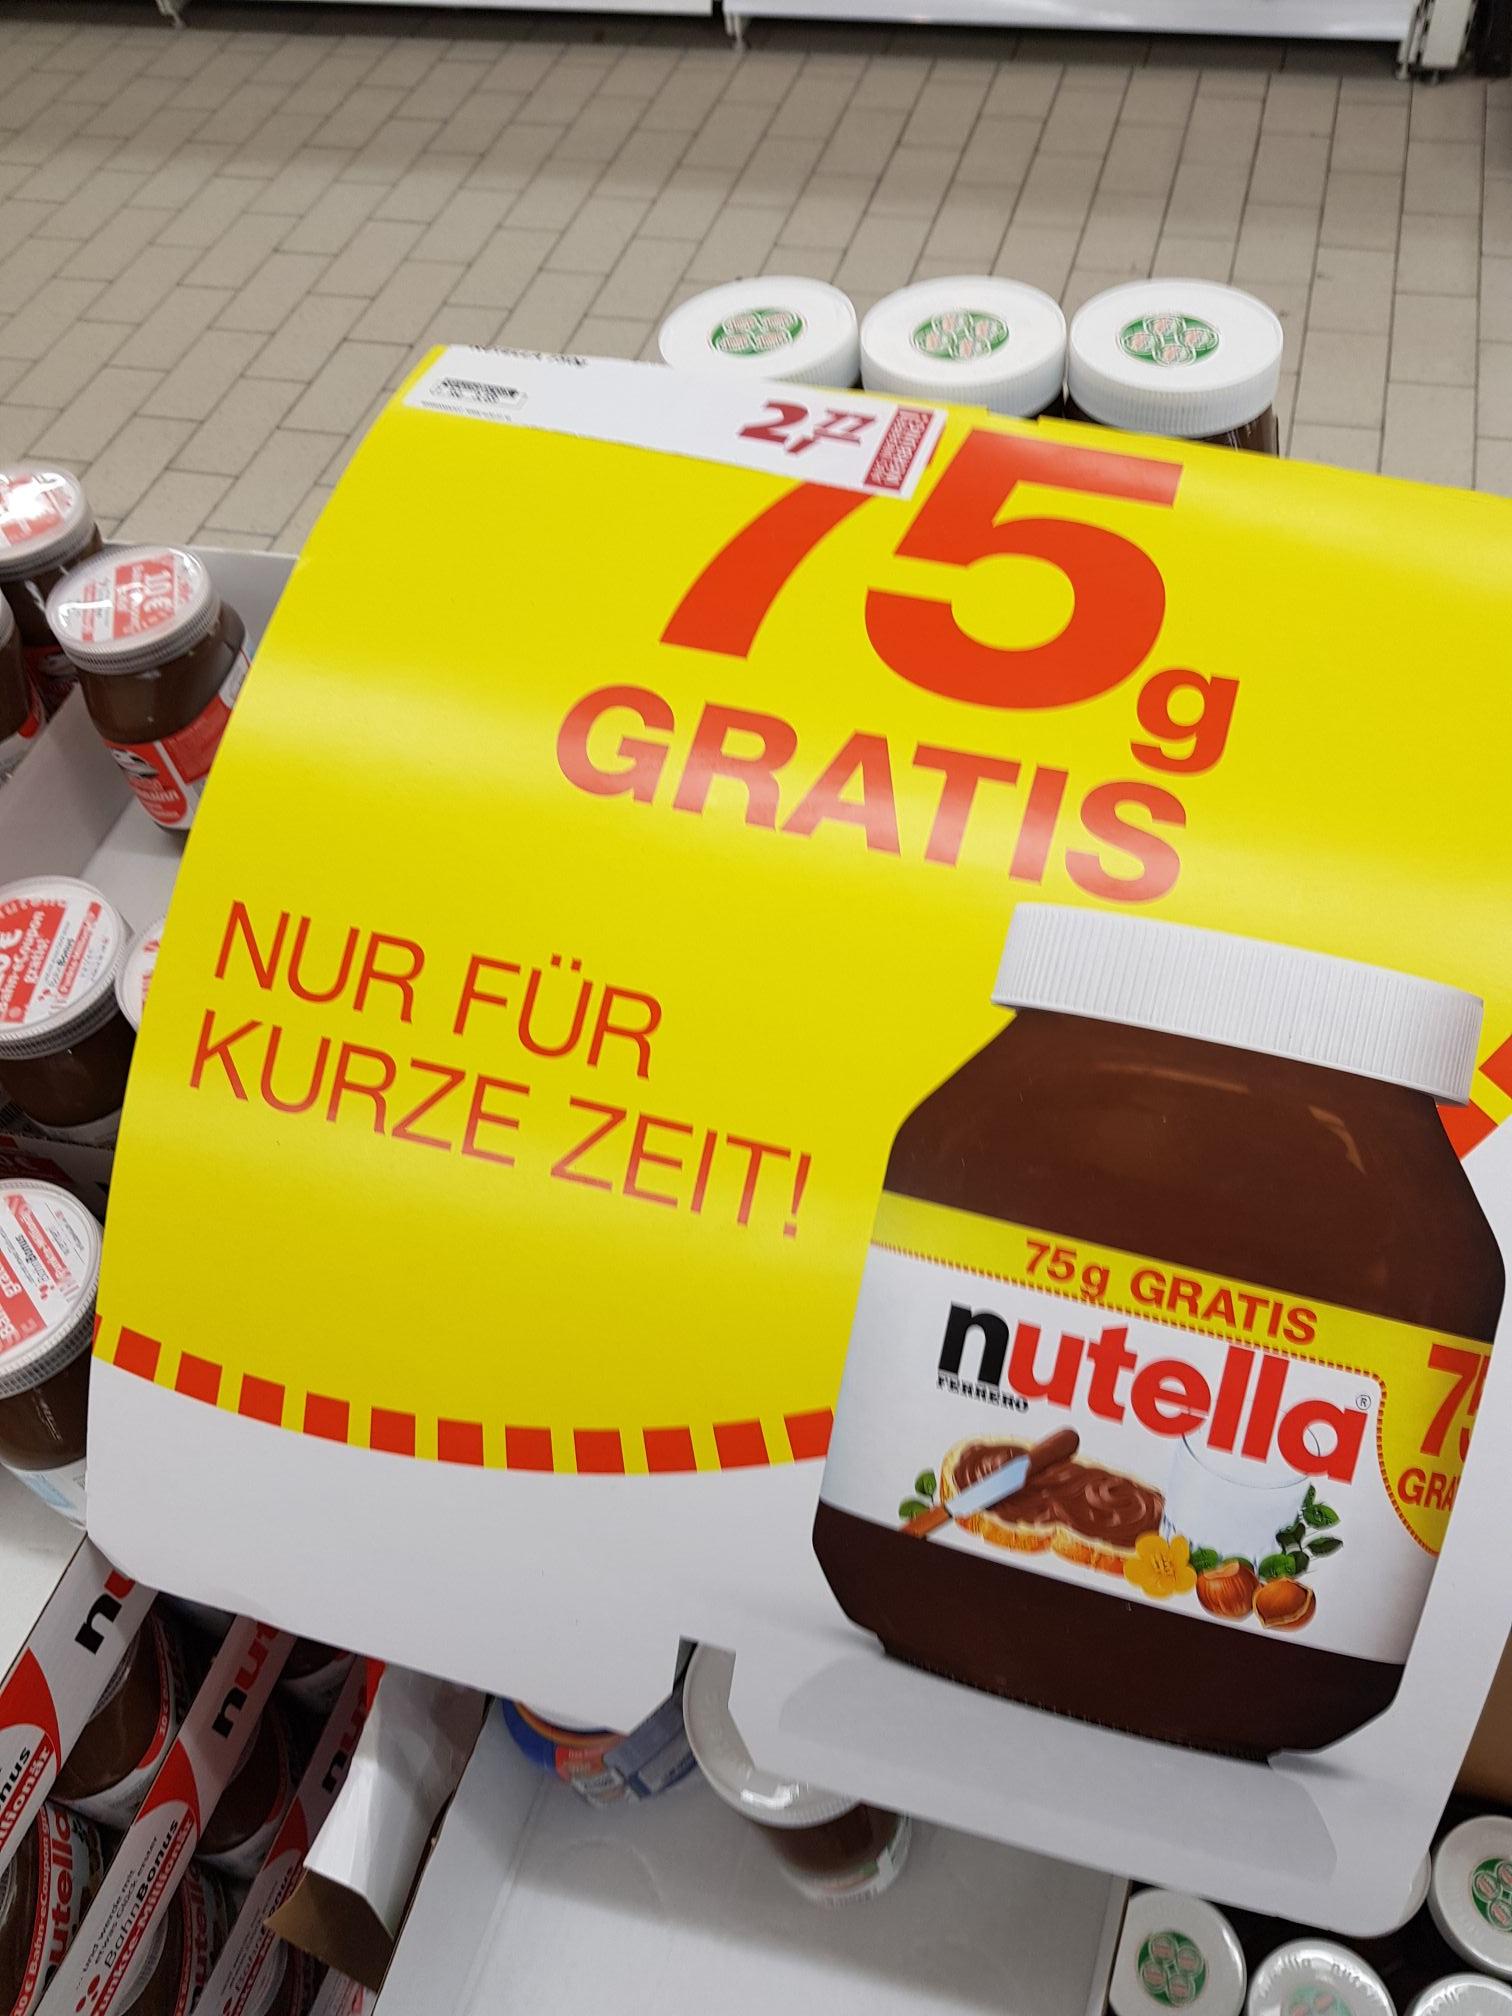 [Real]Nutella 750g Glas+75g gratis